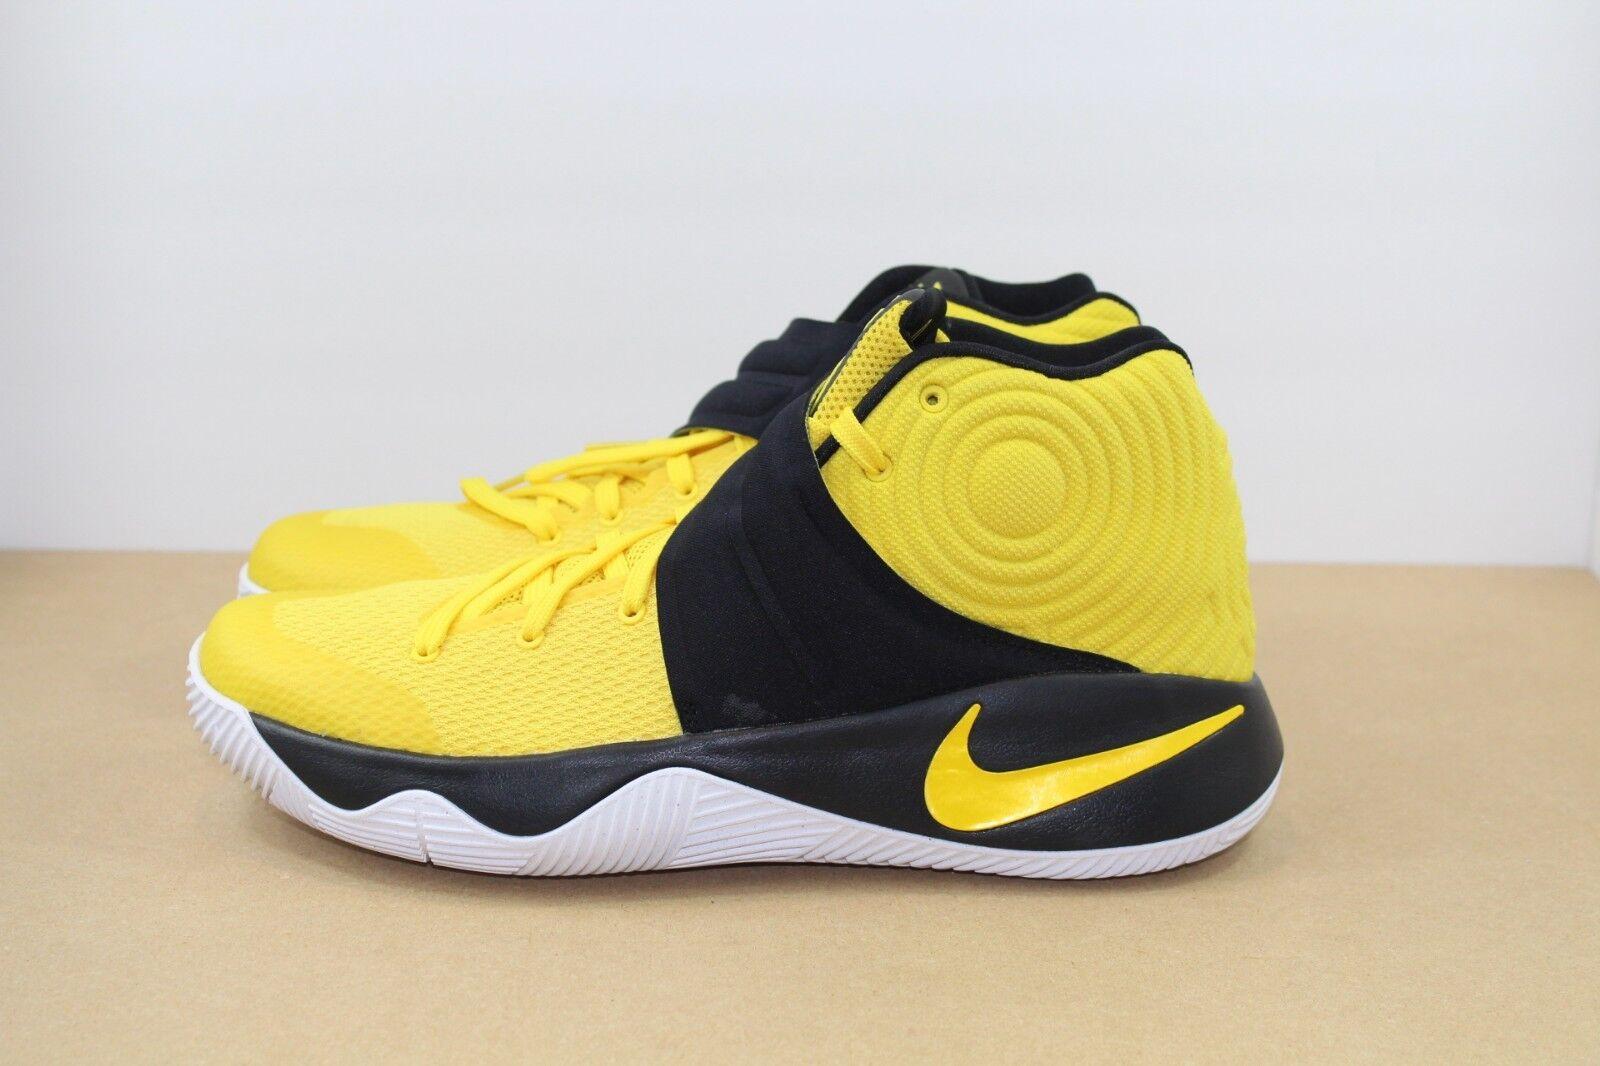 Nike kyrie 2 australien - tour - 10,5 basketball - schuhe der größe 10,5 - 819583-701 gelb - schwarz eca22a